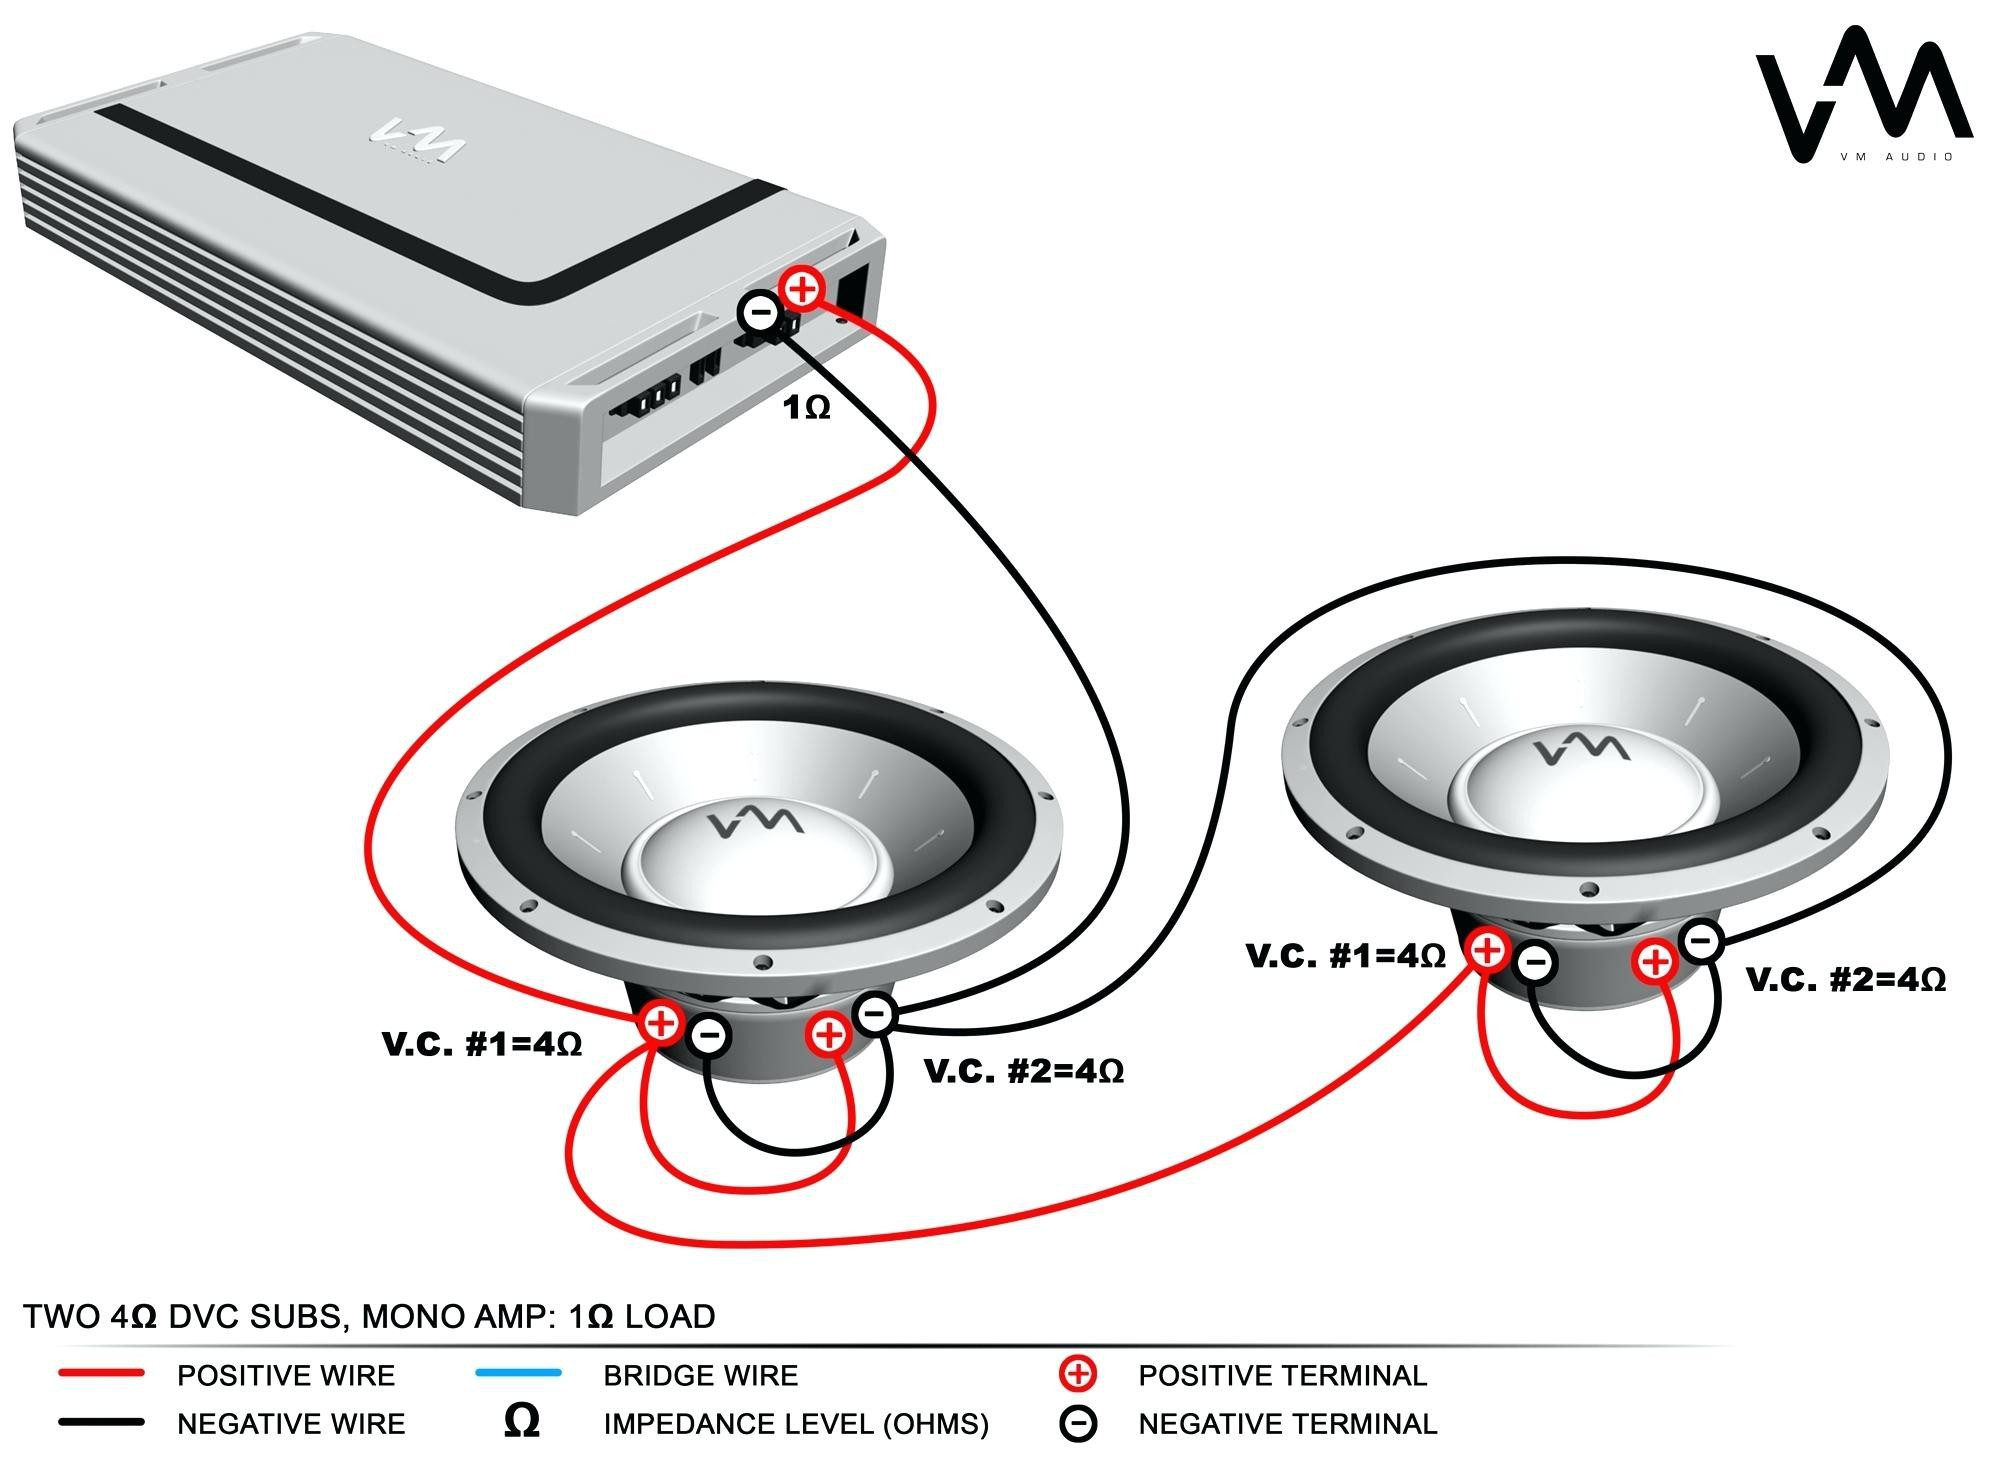 crutchfield 5 channel amp wiring diagram sg 7549  bose wiring diagram crutchfield get free image about  bose wiring diagram crutchfield